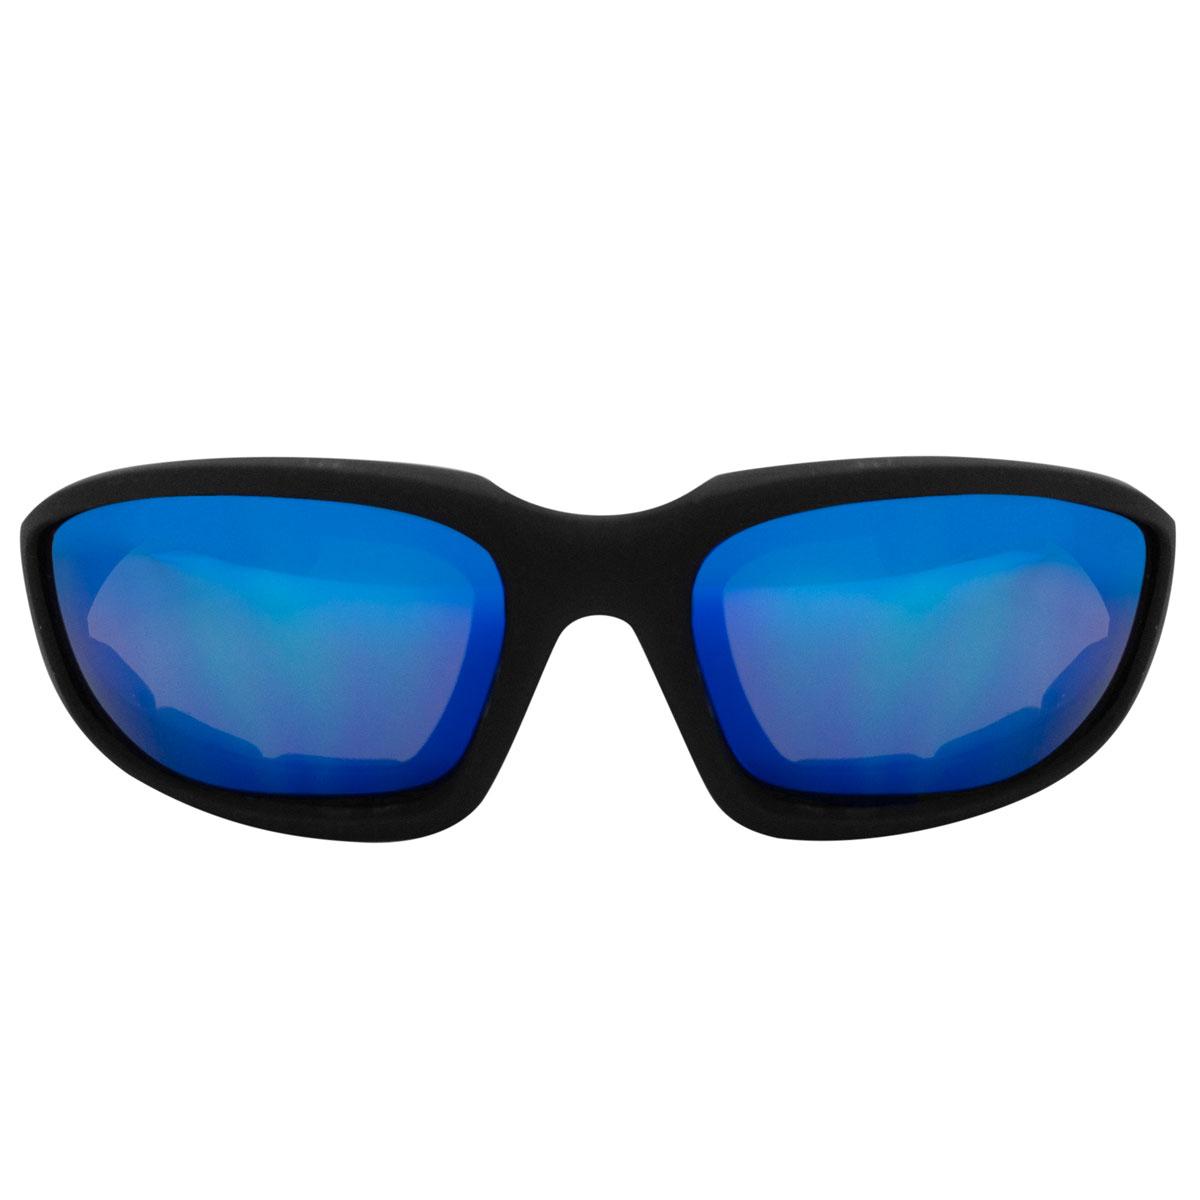 Chap′el Performance Padded Sunglasses